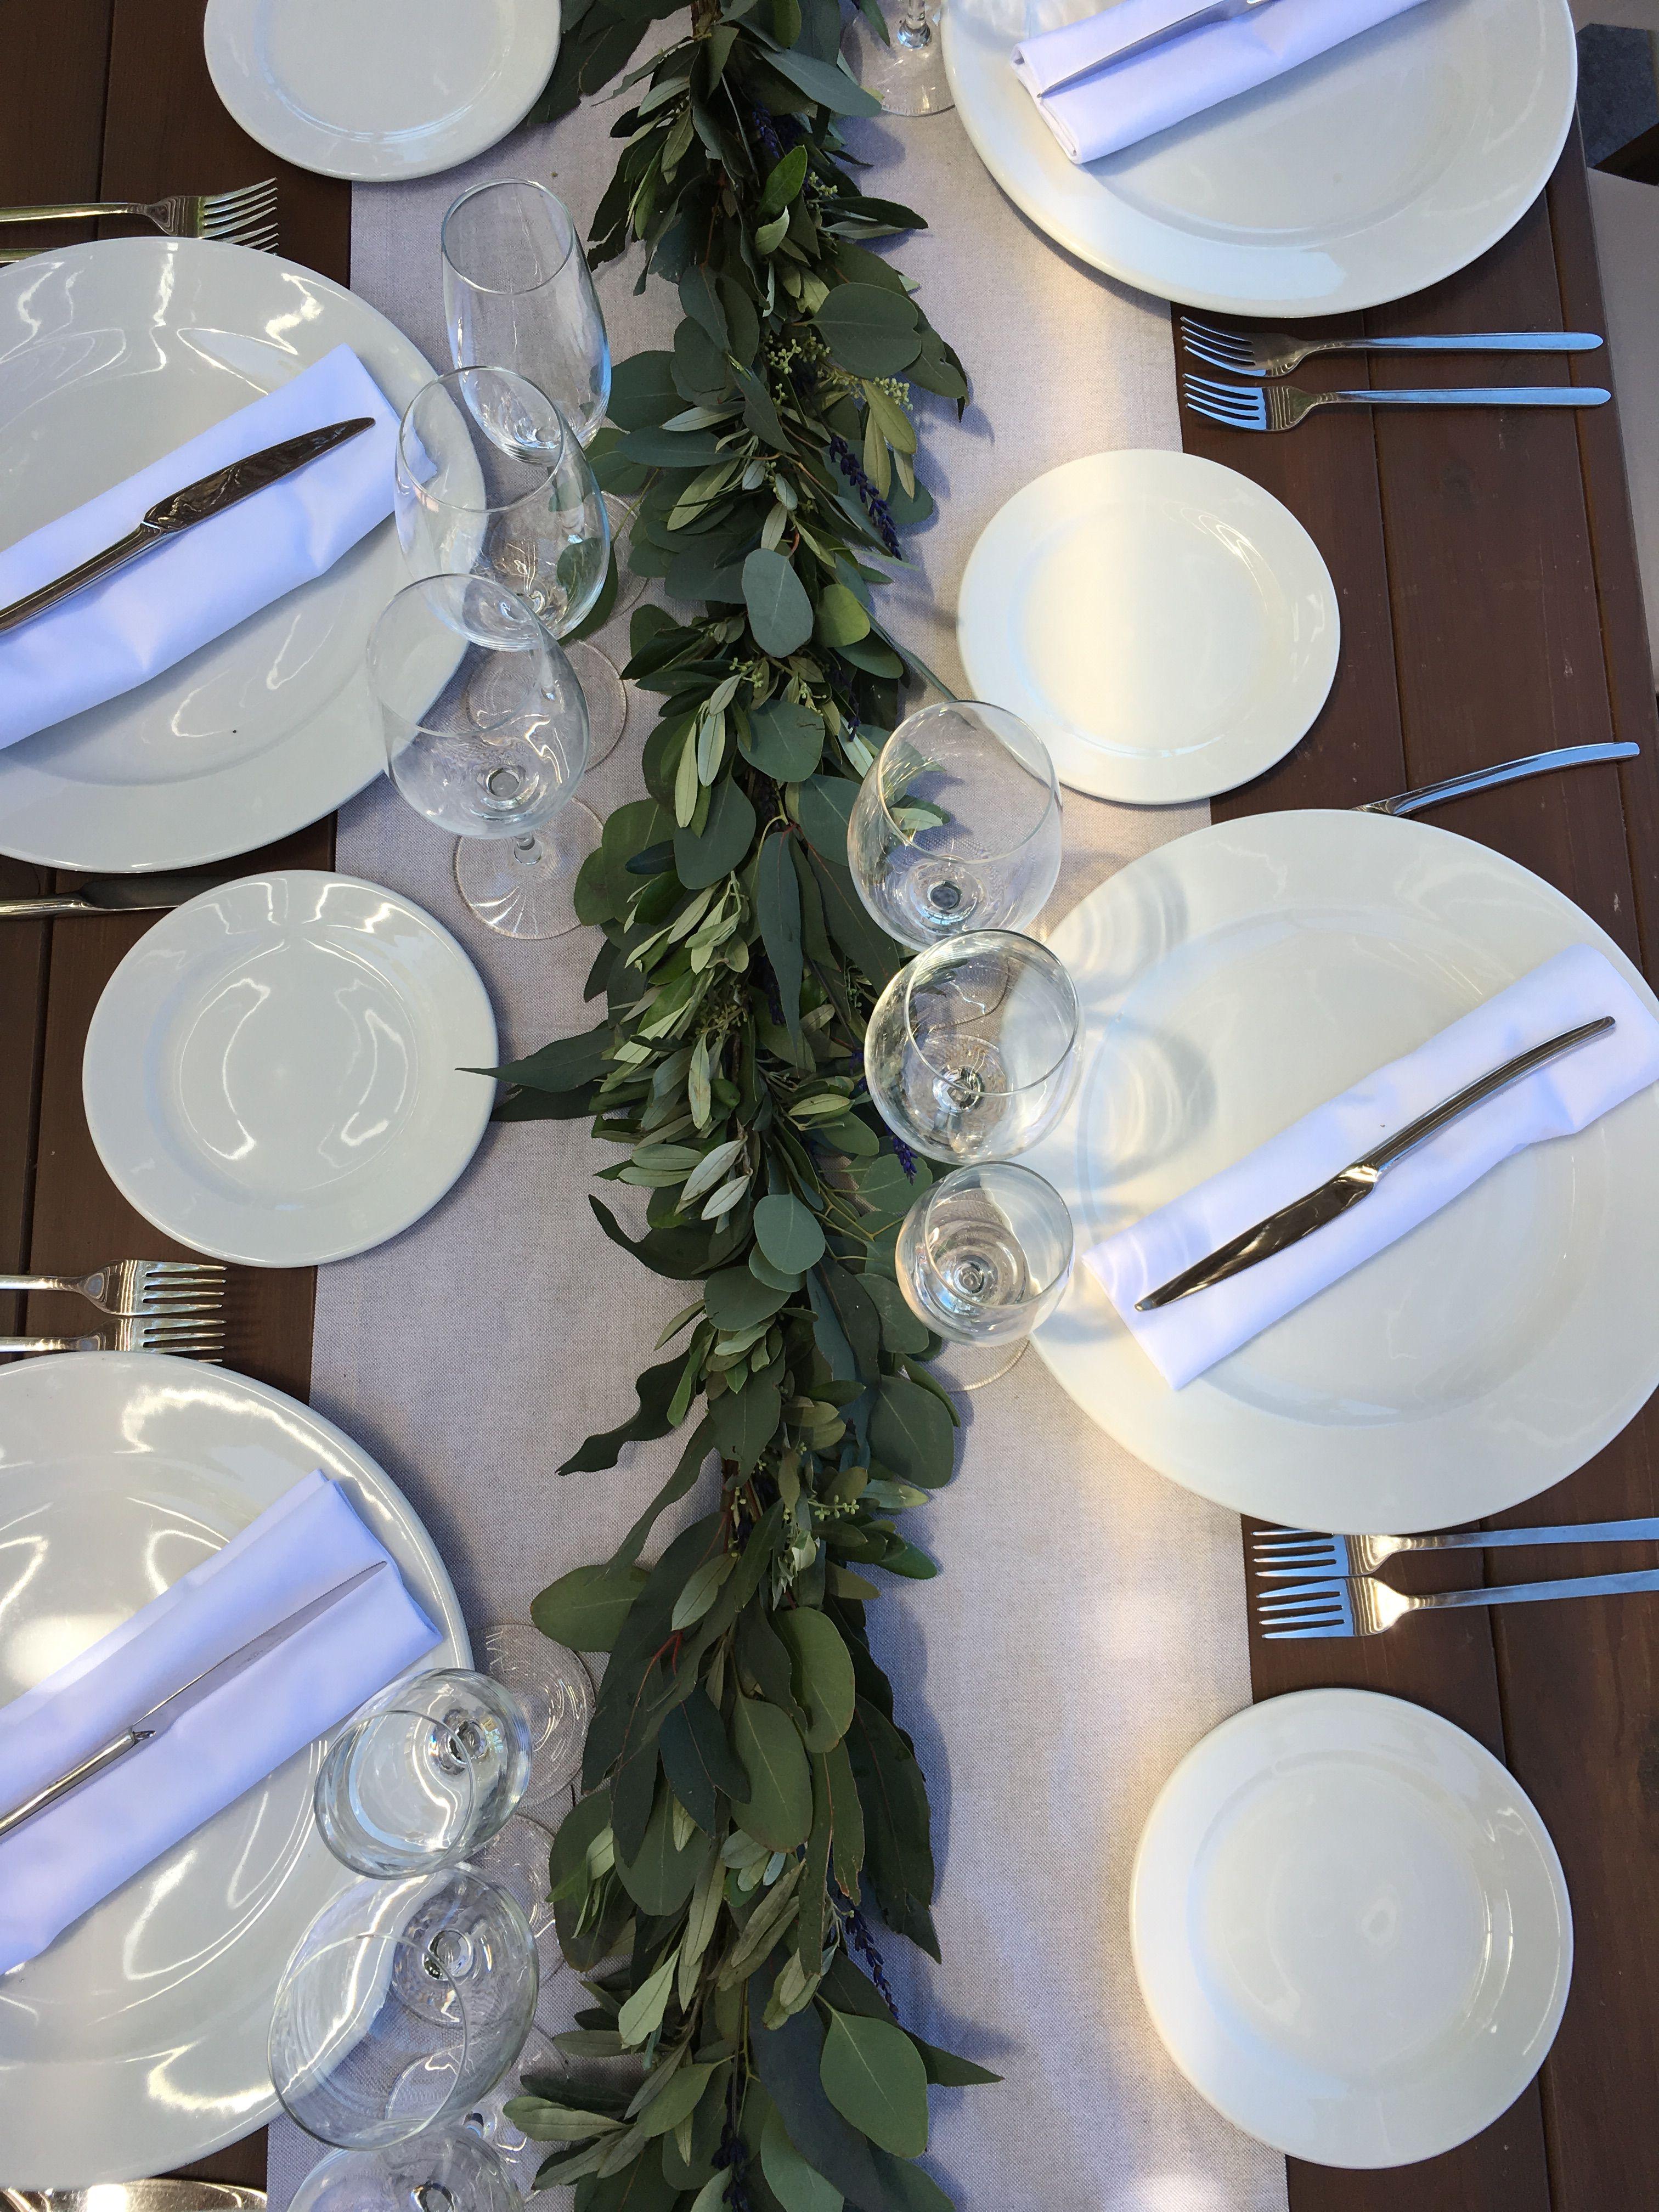 Decoración mesa imperial. Guirnalda de eucaliptos, olivo y lavanda. #flowergarland #greengarland #tabledecoration #wedding #spanishwedding #rusticwedding #casafelix #boda #decoracionboda #sitges #sitgesbodas #weddingsitges #mediterraneanwedding